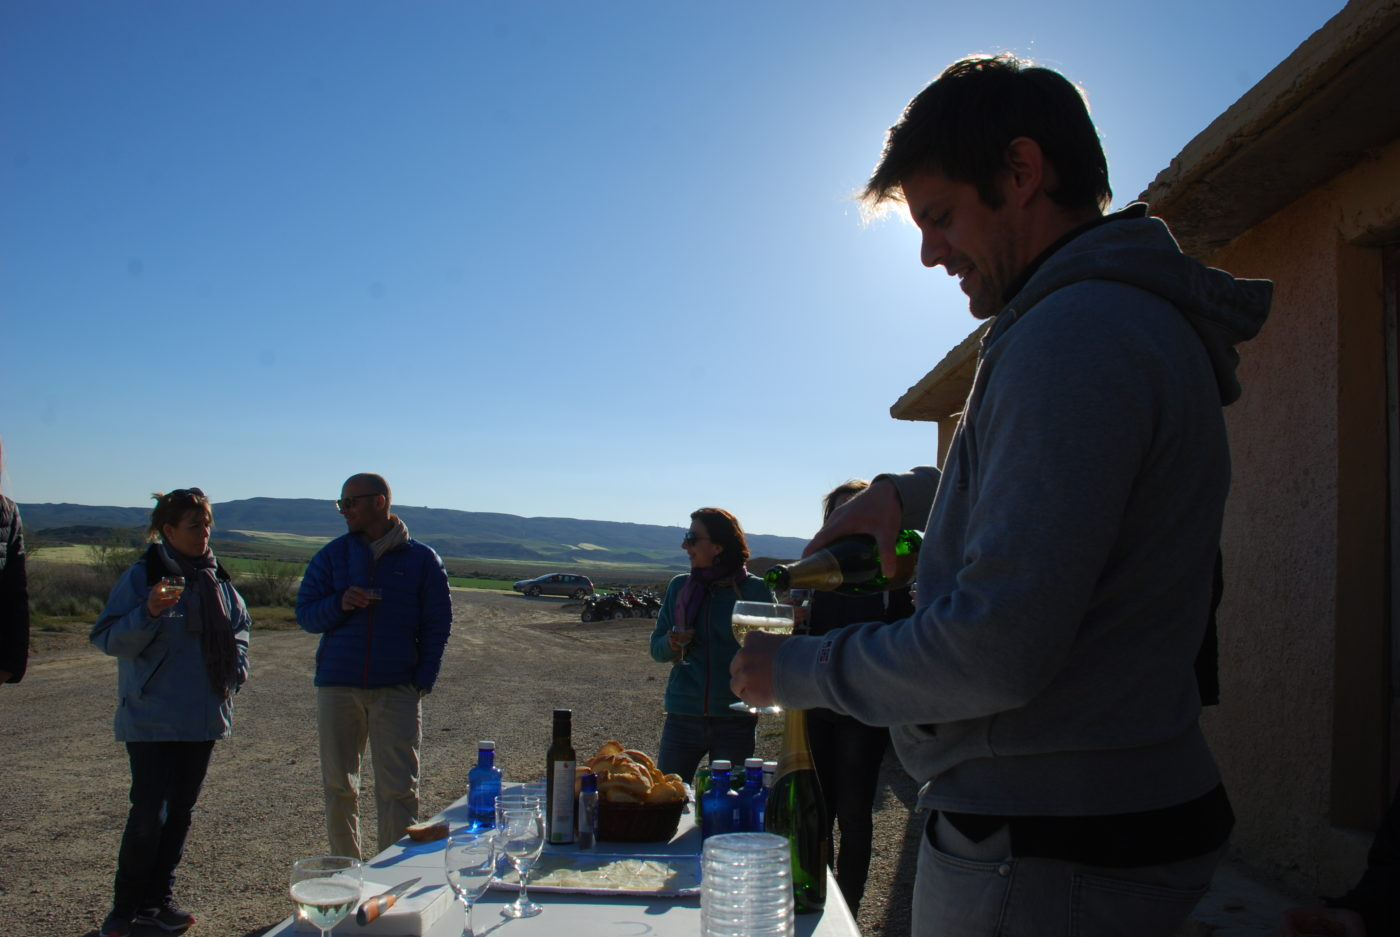 Incentive-seminaire-pays-basque-navarre-bodega-quad-bardenas-olite-grottes-troglodytes-cuevas-agence-evenementielle-erronda